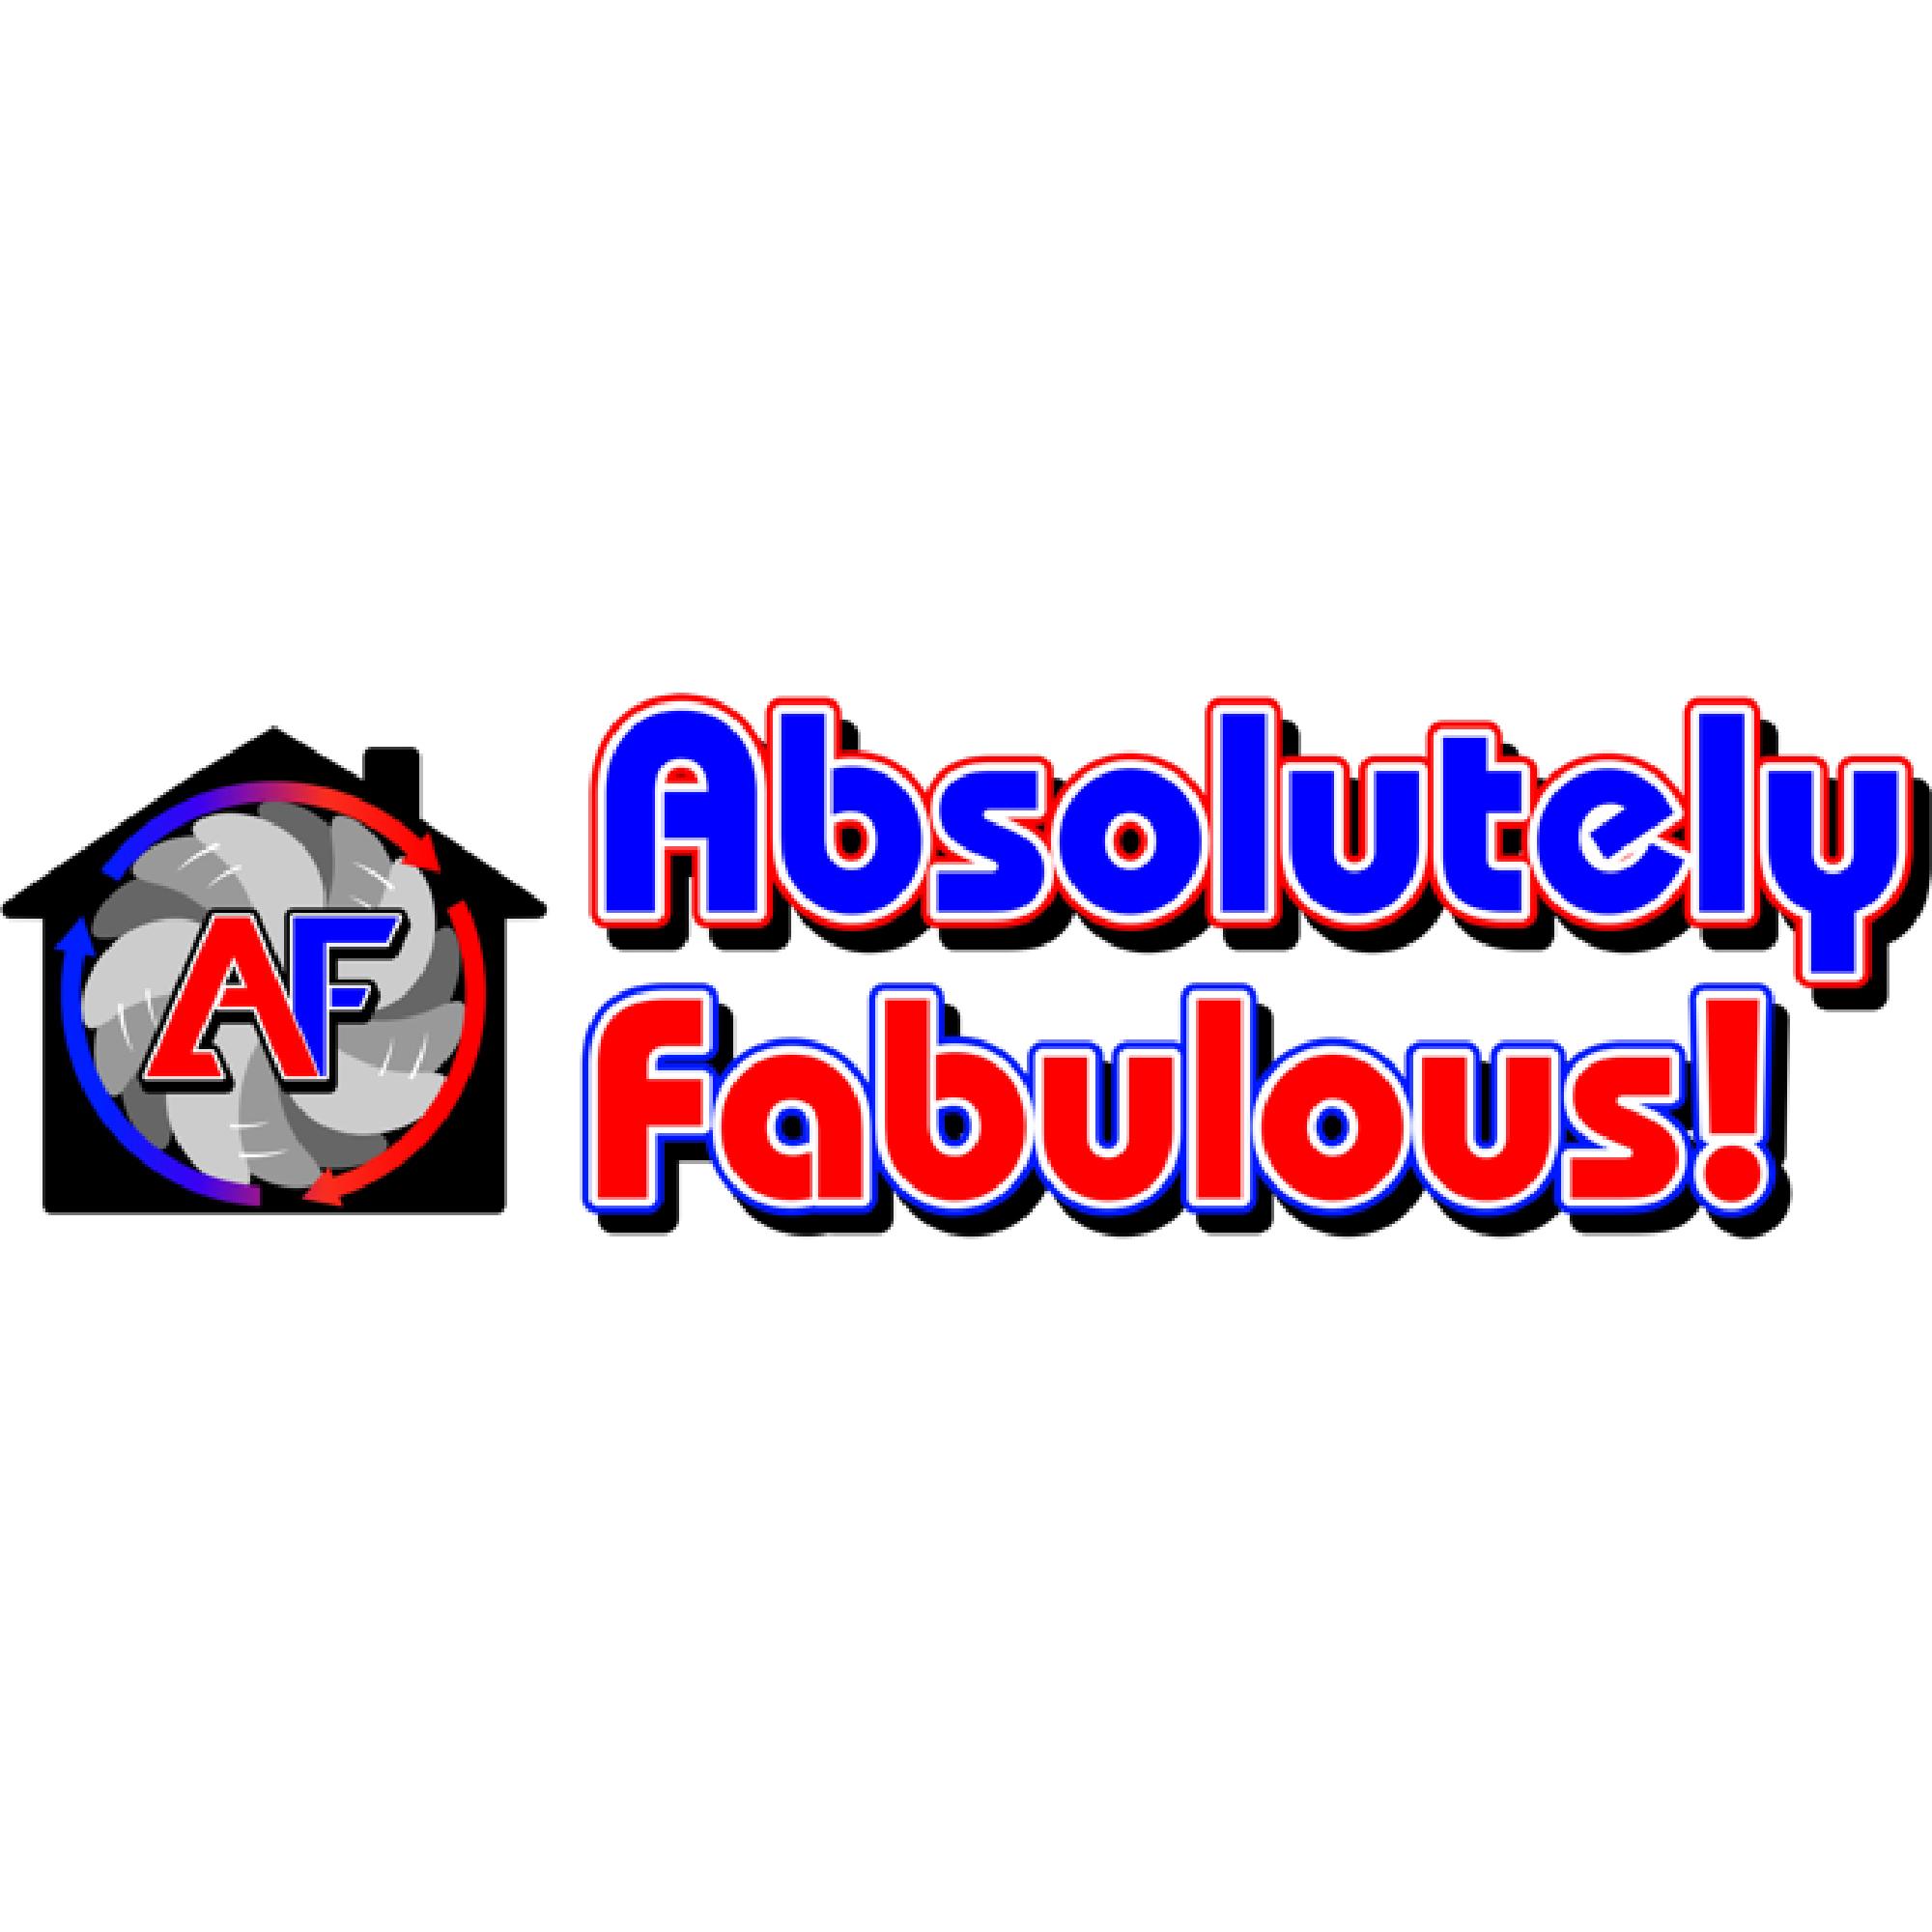 Absolutely Fabulous HVAC - Gig Harbor, WA 98335 - (253)358-7691 | ShowMeLocal.com